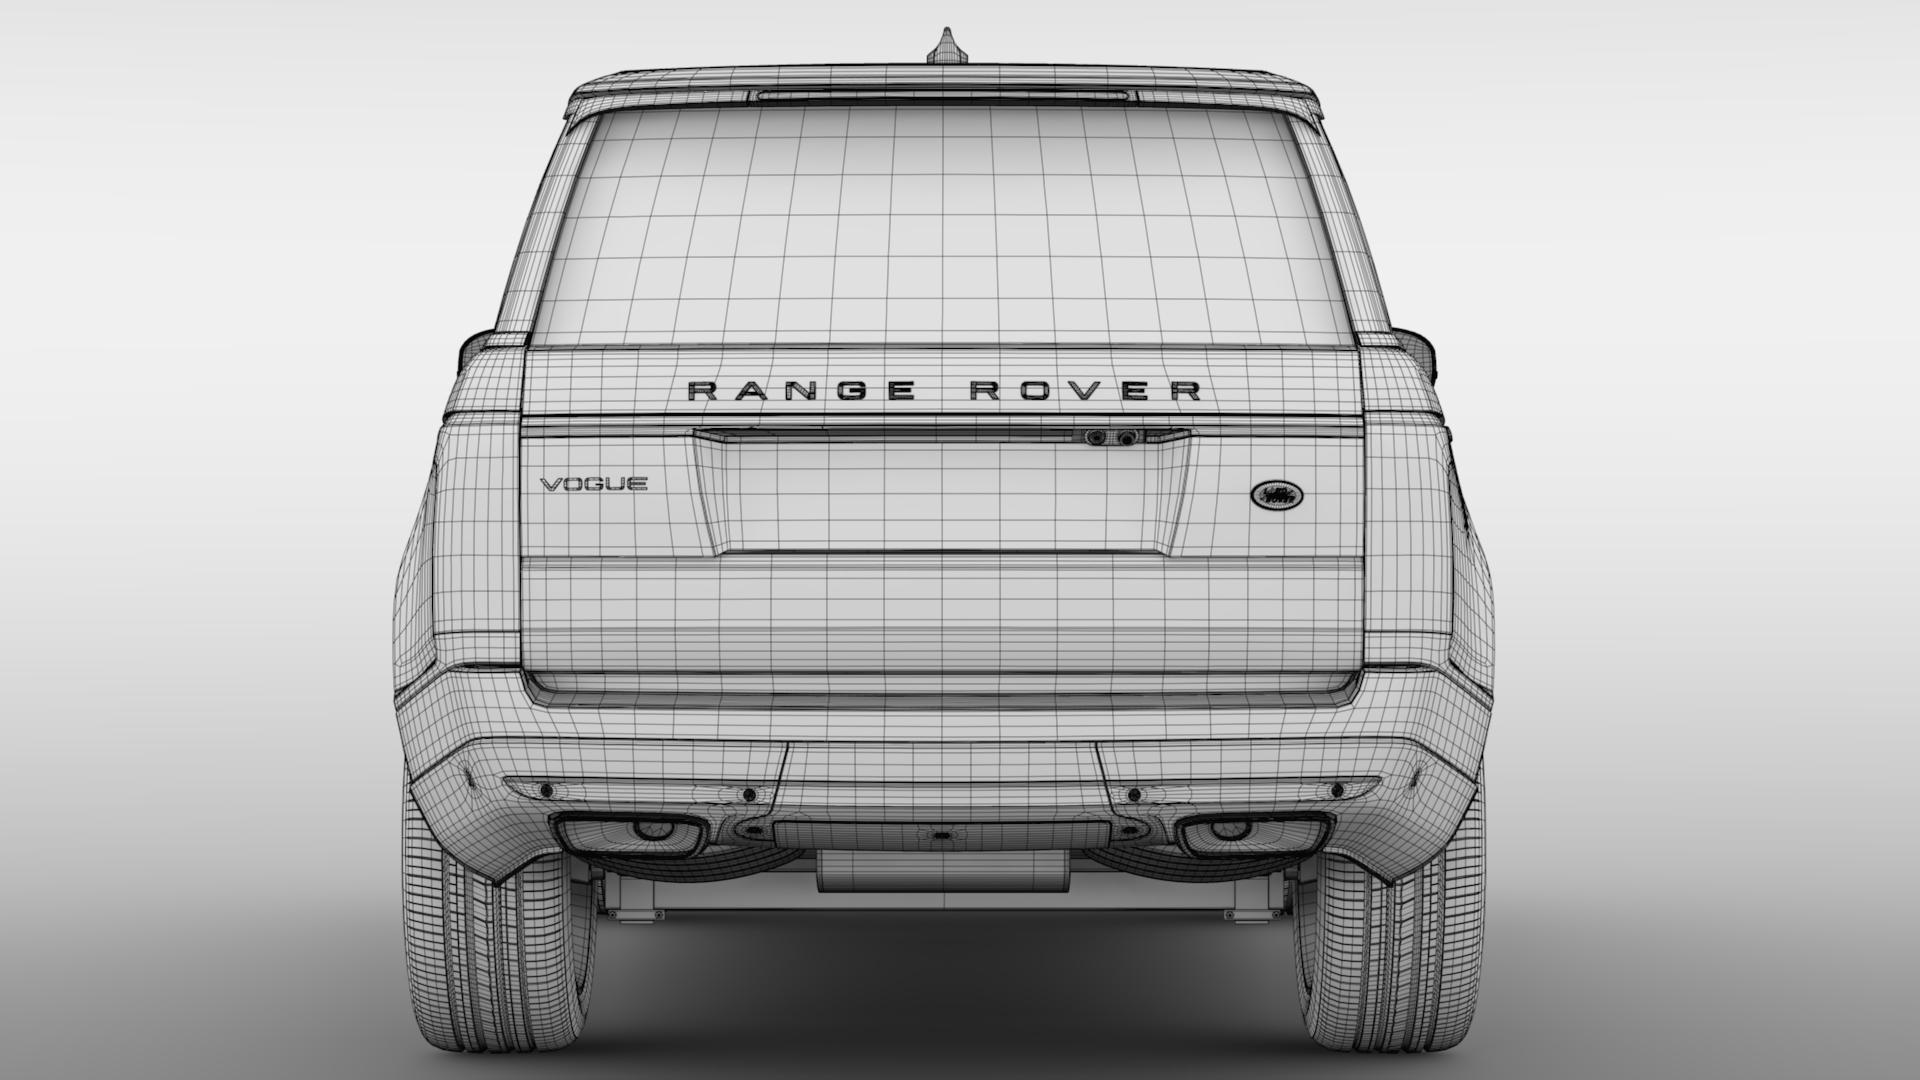 range rover vogue lwb l405 2018 3d model max fbx c4d lwo ma mb hrc xsi obj 277539